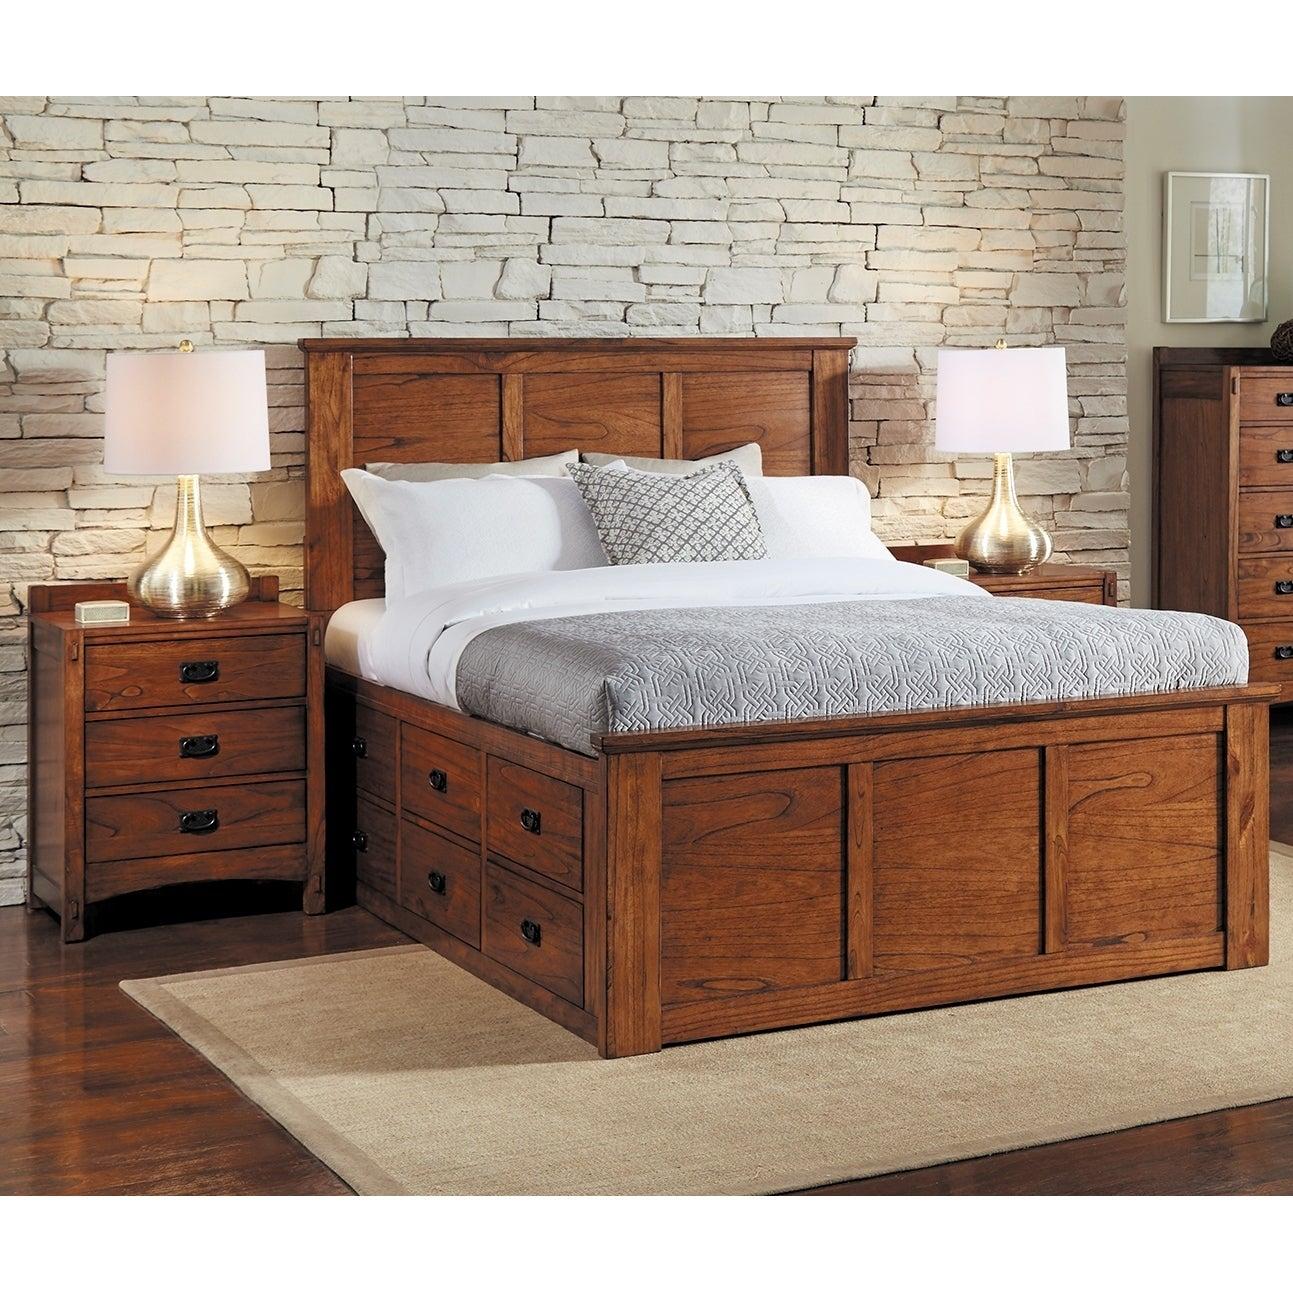 Shop Aira 3-piece Solid Wood Queen Storage Bedroom Set - Free ...